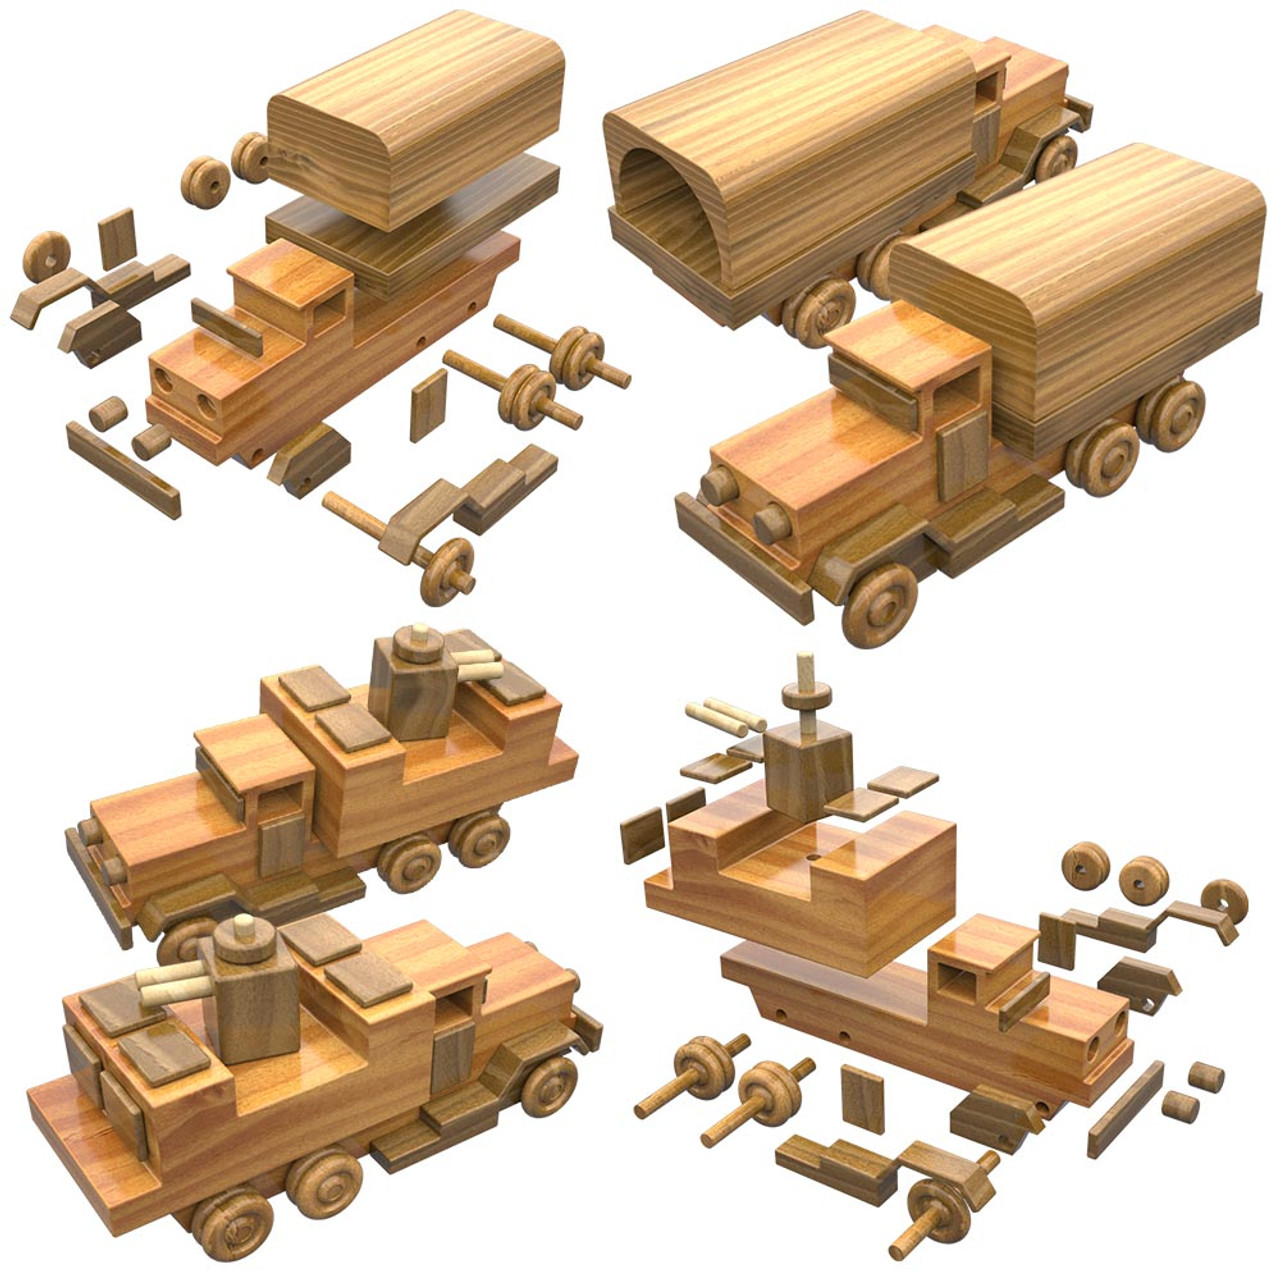 military miniatures troop, fuel, gun trucks + field hospital wood toy plans  (2 pdf downloads)